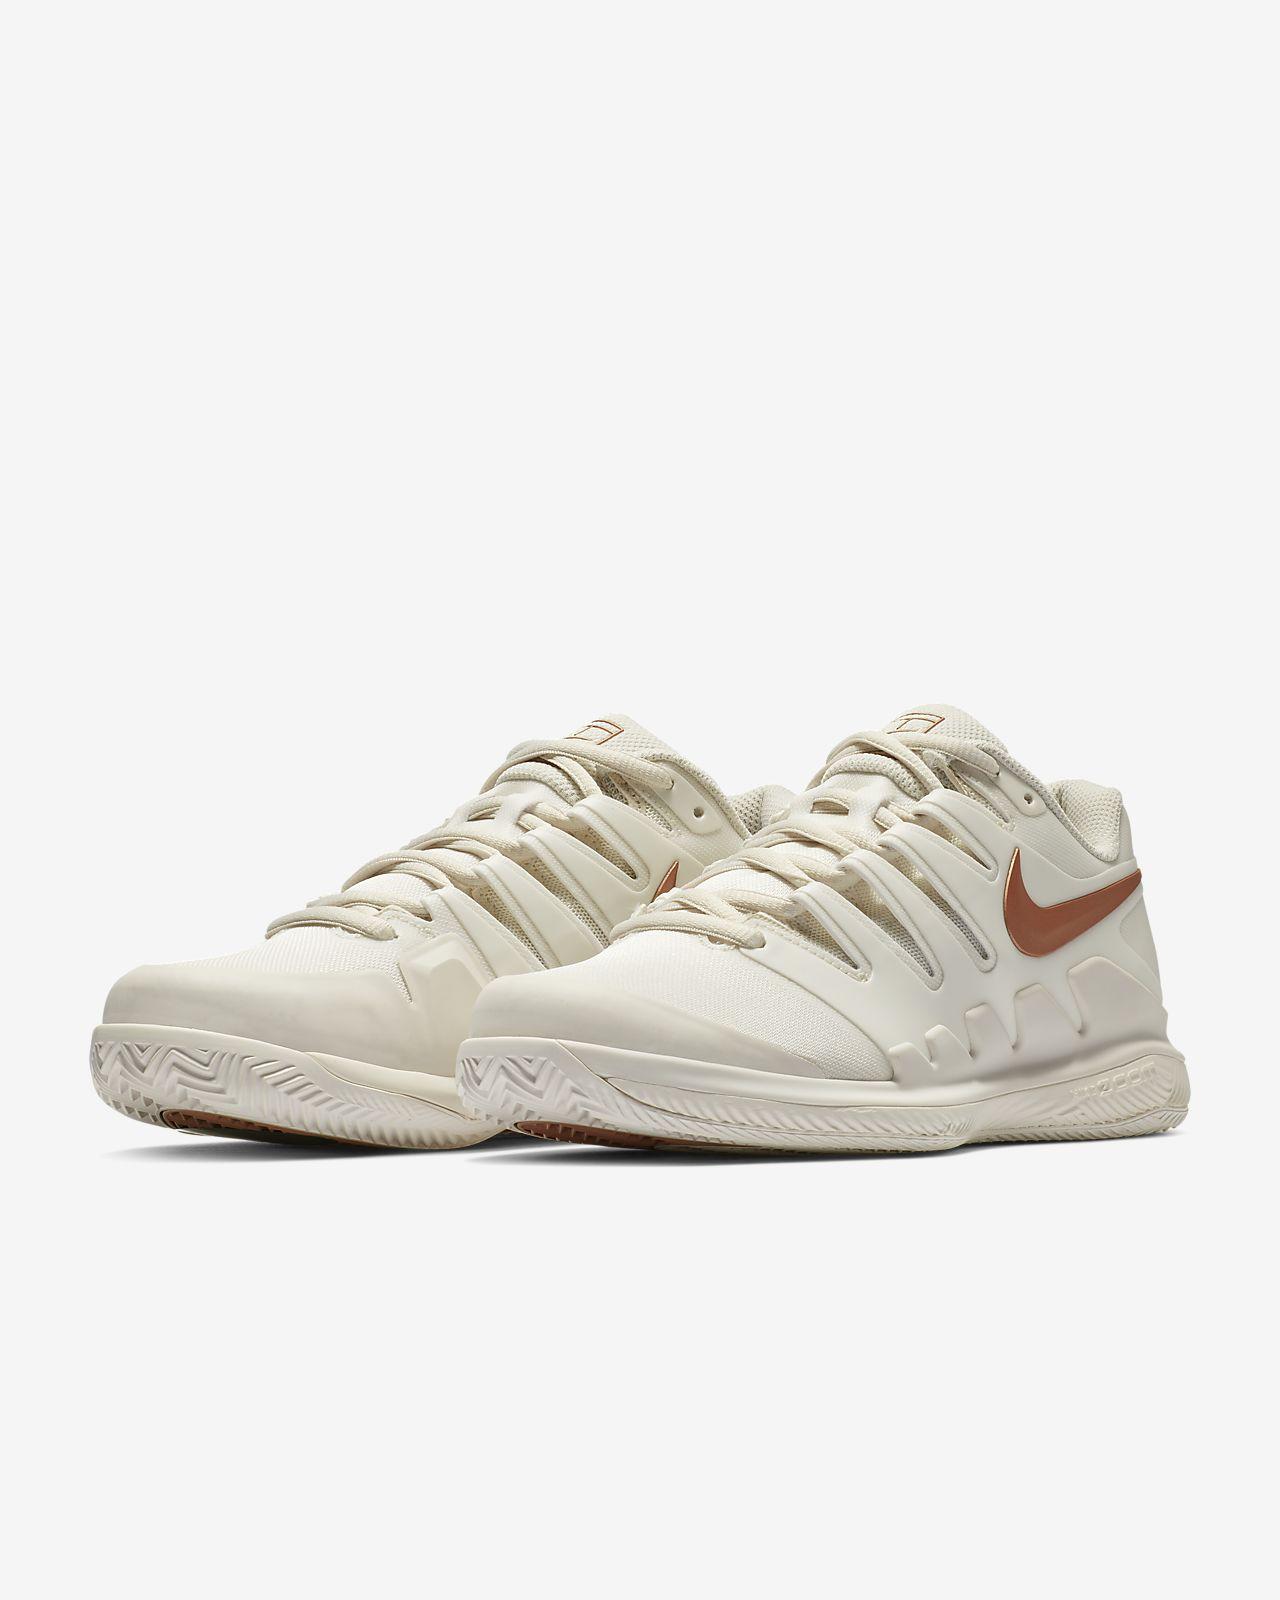 best service 0cb5e 29d20 ... Nike Air Zoom Vapor X Clay Women s Tennis Shoe